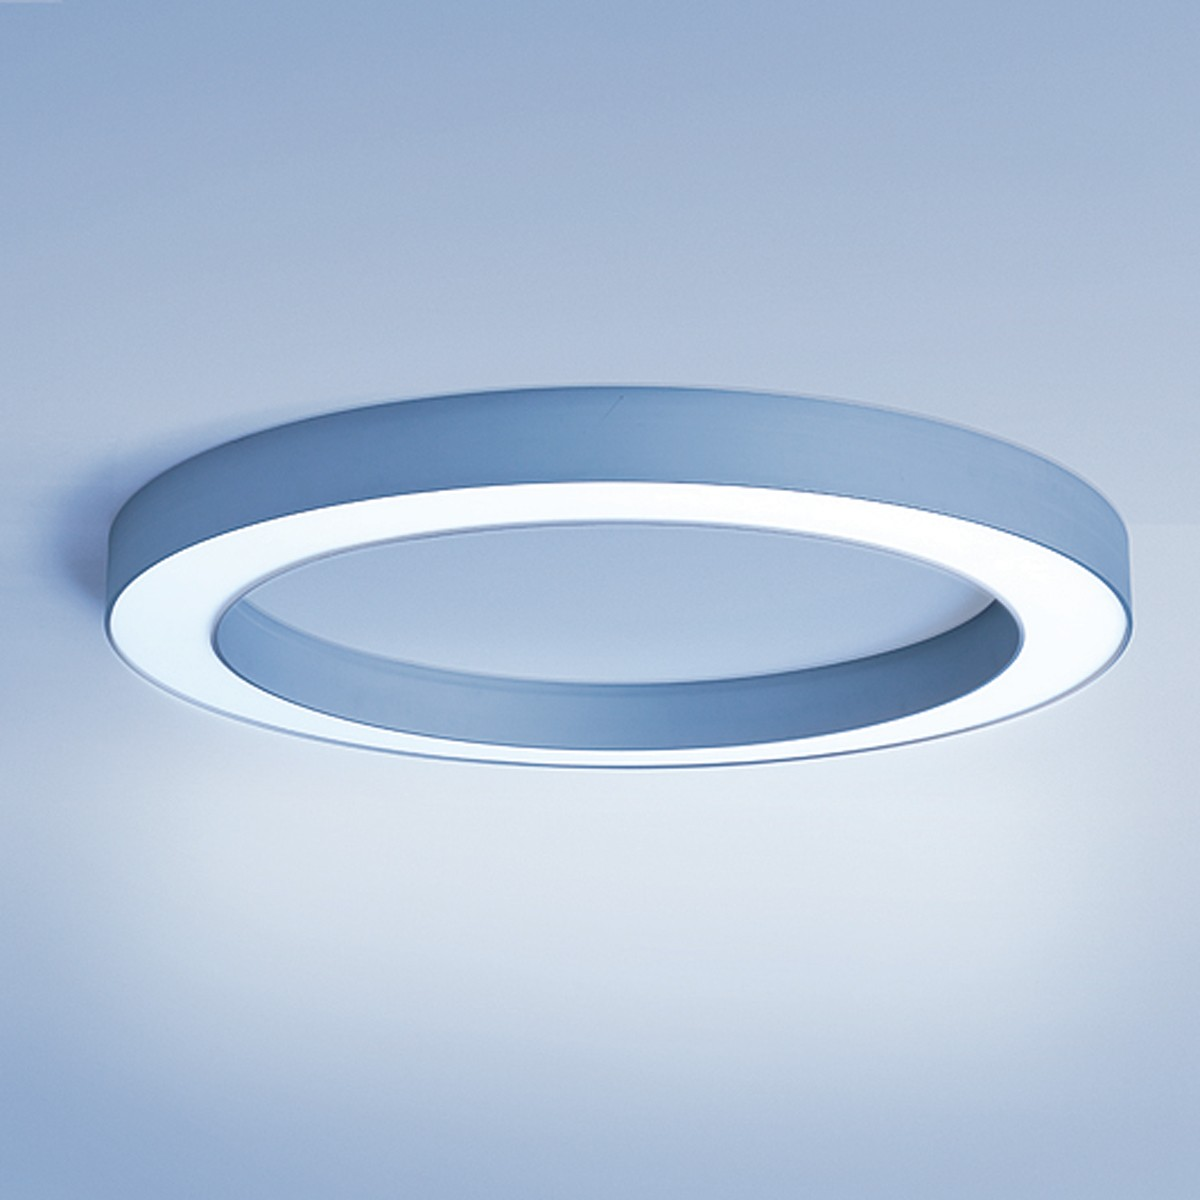 lightnet ringo star a1 wand deckenleuchte 60 cm silber matt mobil saege werk bickenbach. Black Bedroom Furniture Sets. Home Design Ideas